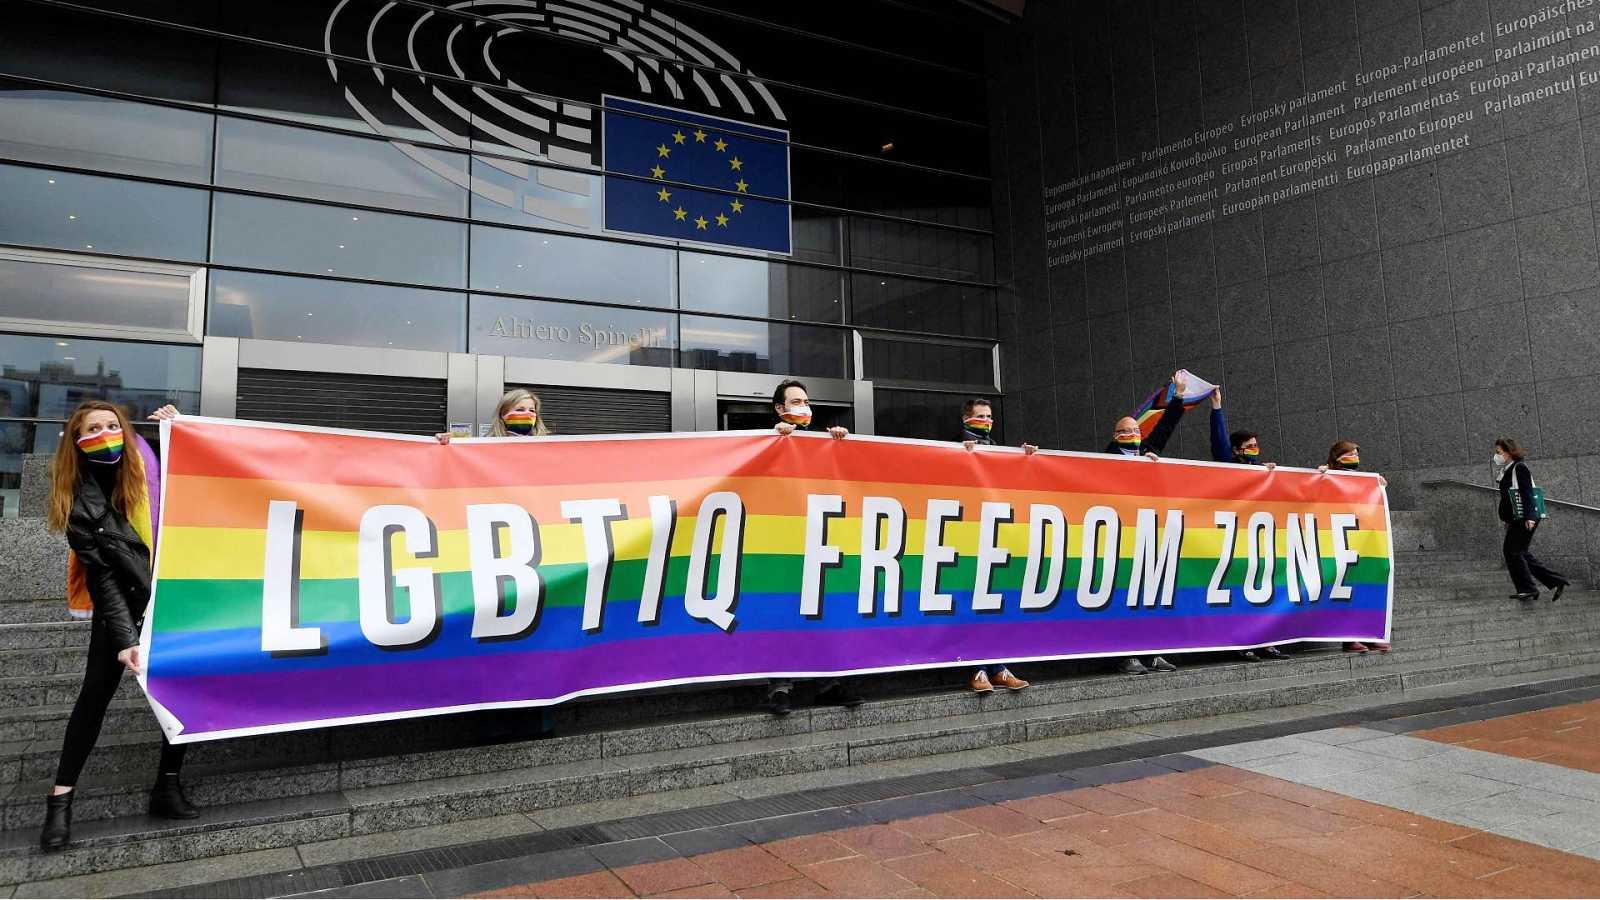 Miembros del Parlamento Europeo muestran su apoyo al colectivo LGTBIQ